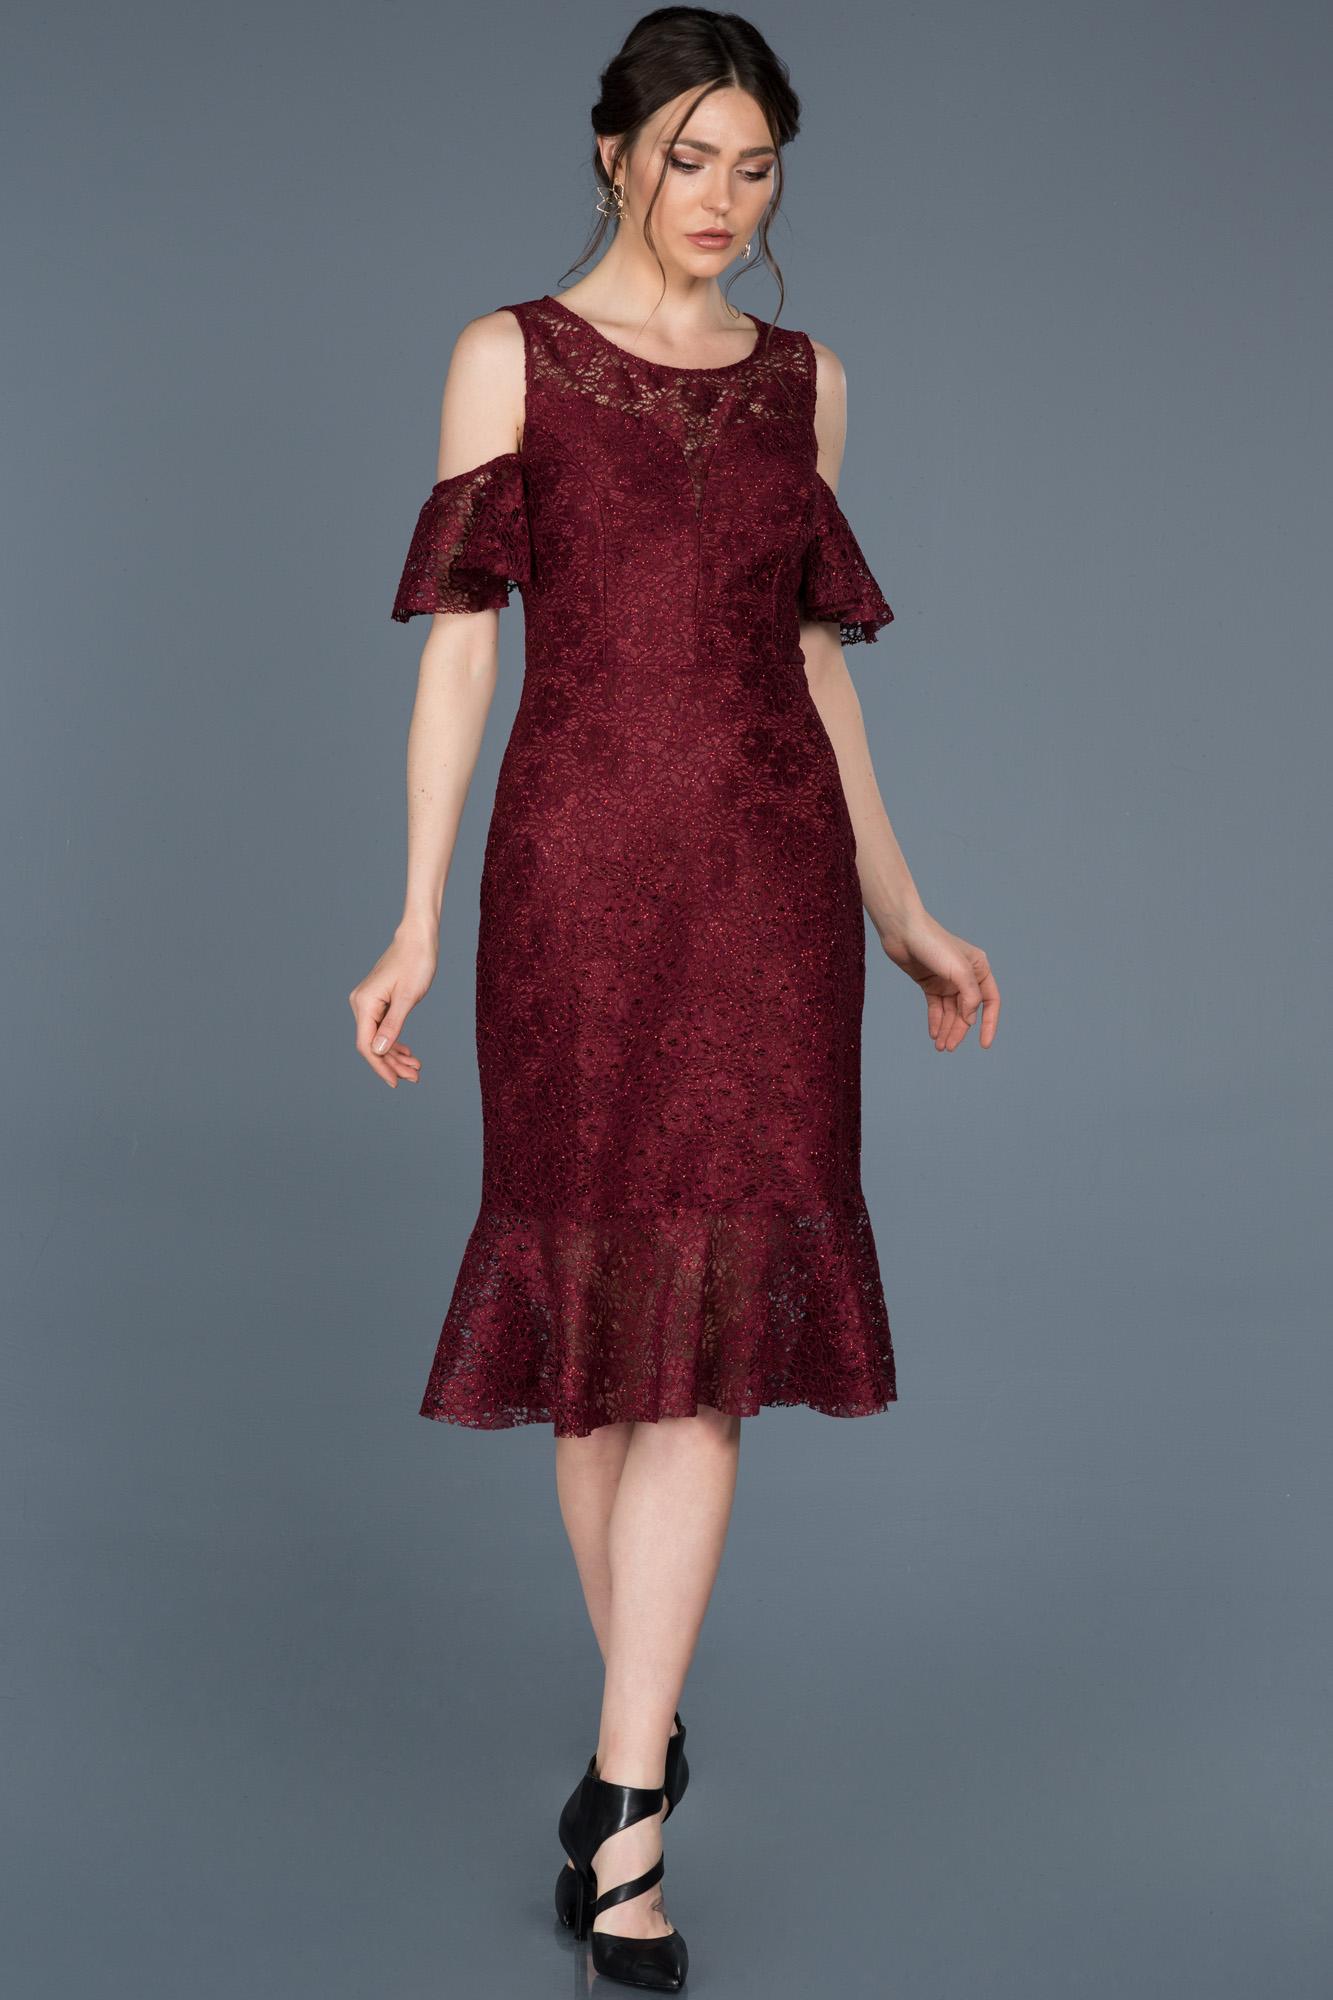 Midi Bordo Güpürlü Davet Elbisesi